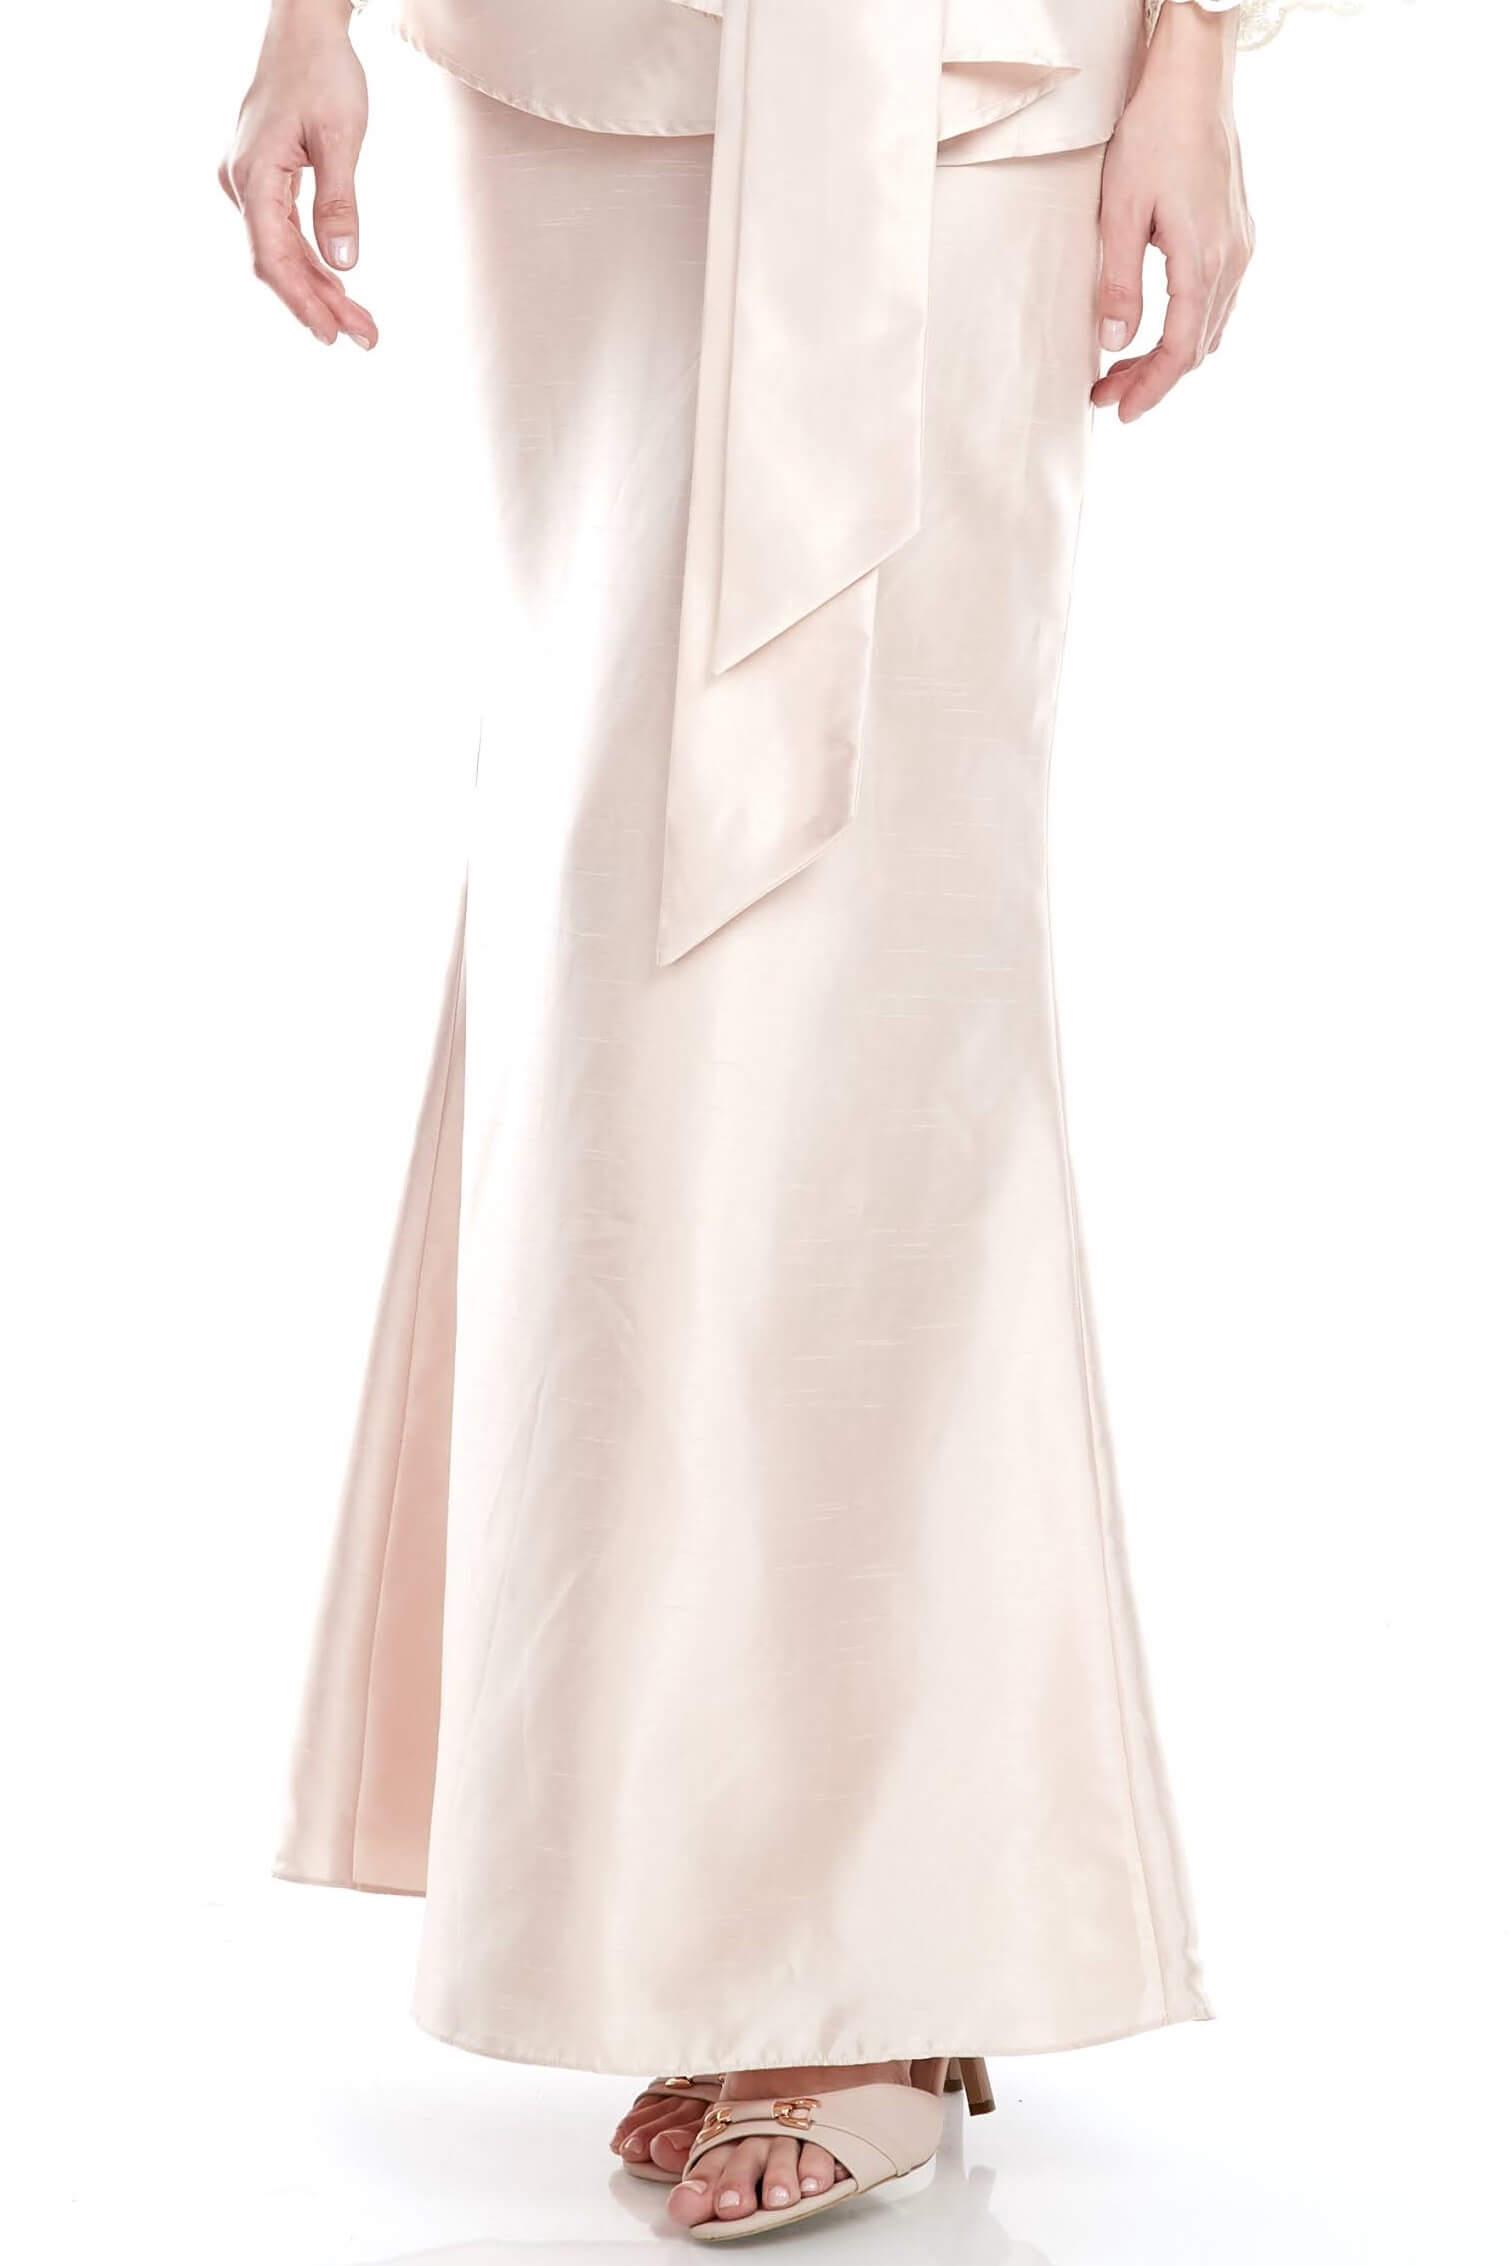 Peach Mermaid Skirt (4)